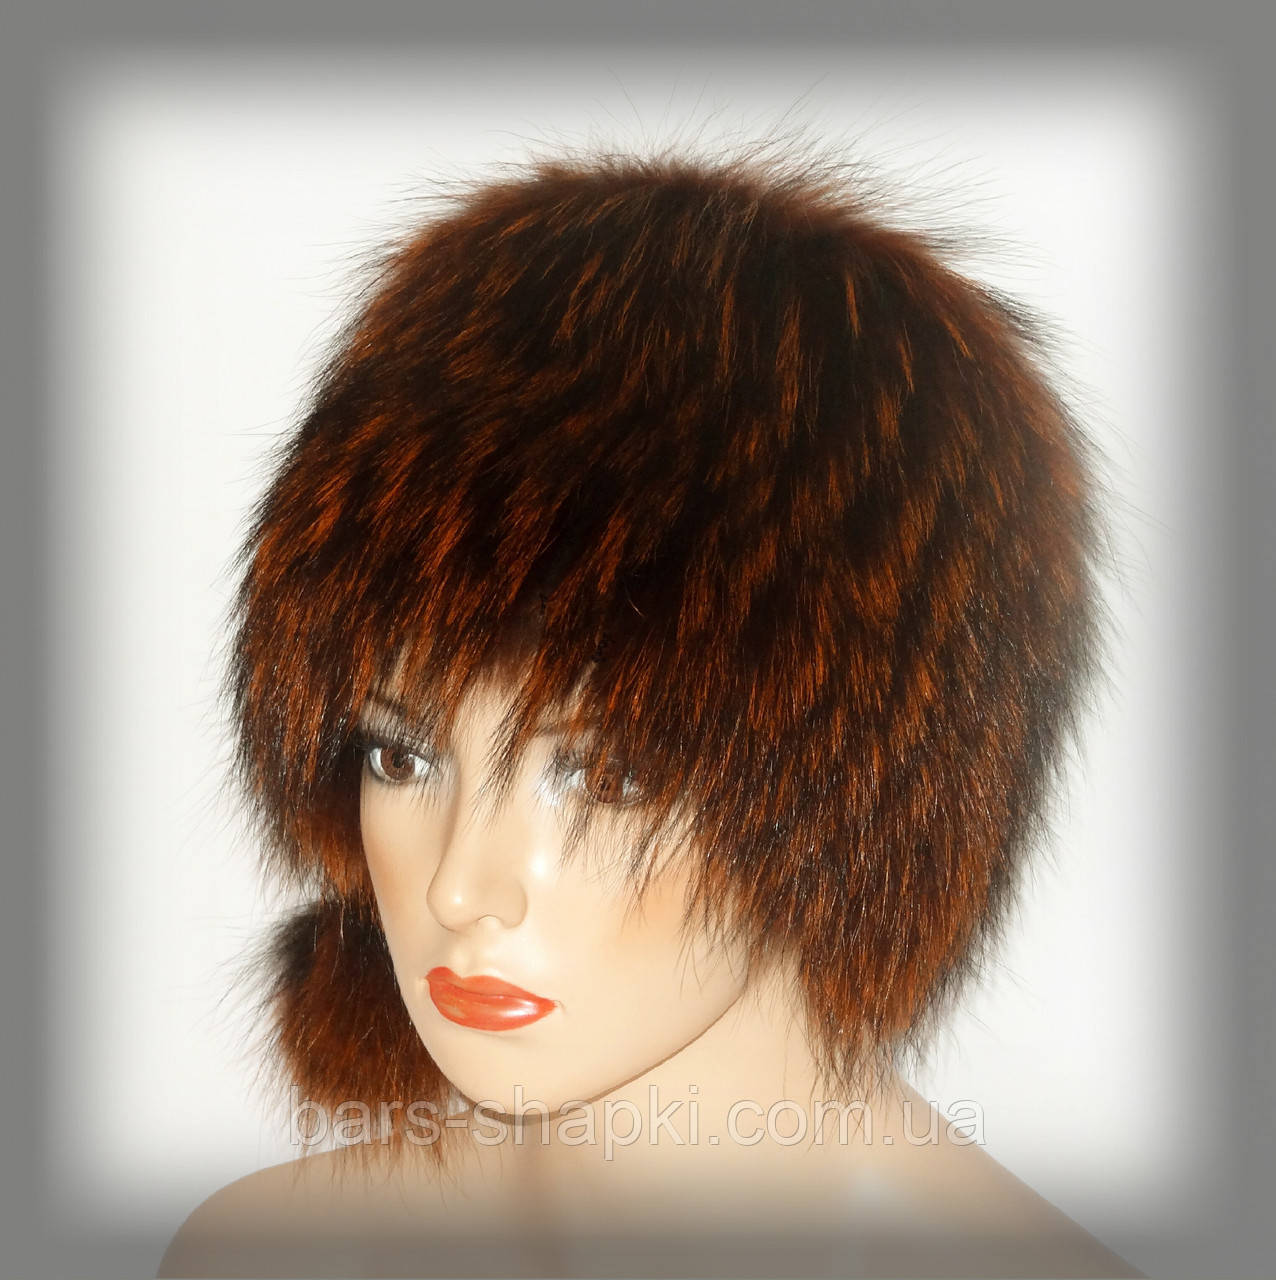 Меховая шапка из енота (рыжая кубанка)